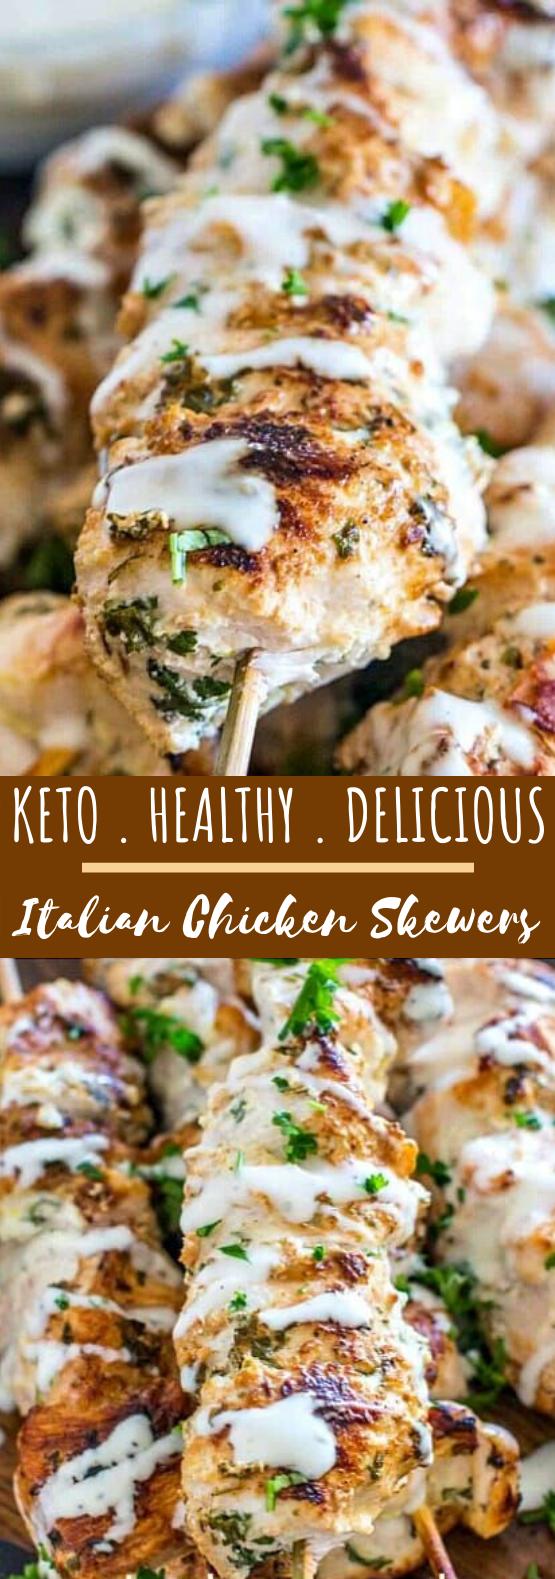 Keto Italian Chicken Skewers #keto #recipe #grilling #chicken #lowcarb